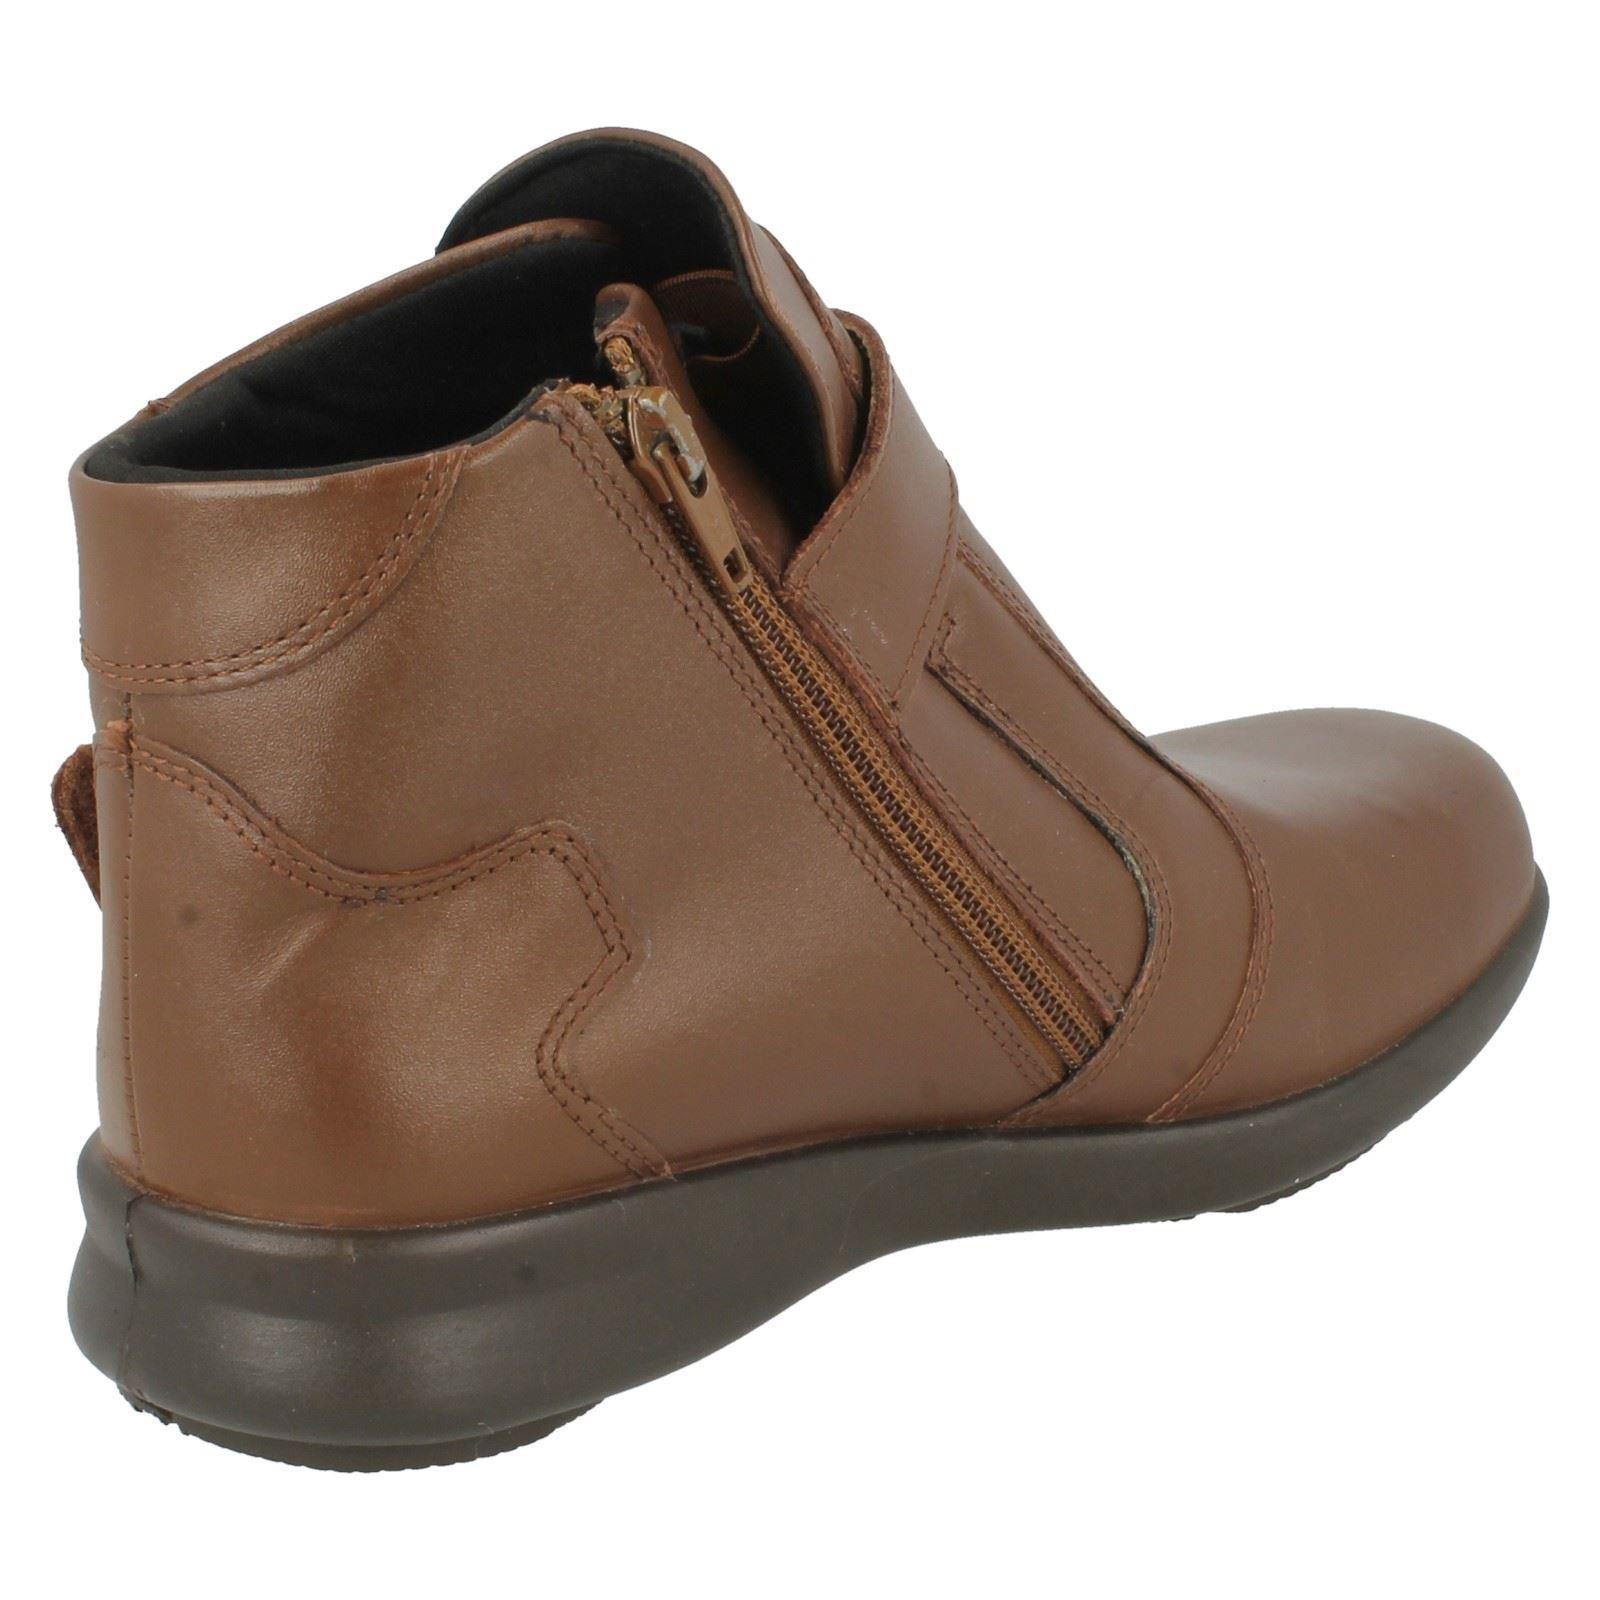 Amazon Uk Wide Fit Ladies Shoes